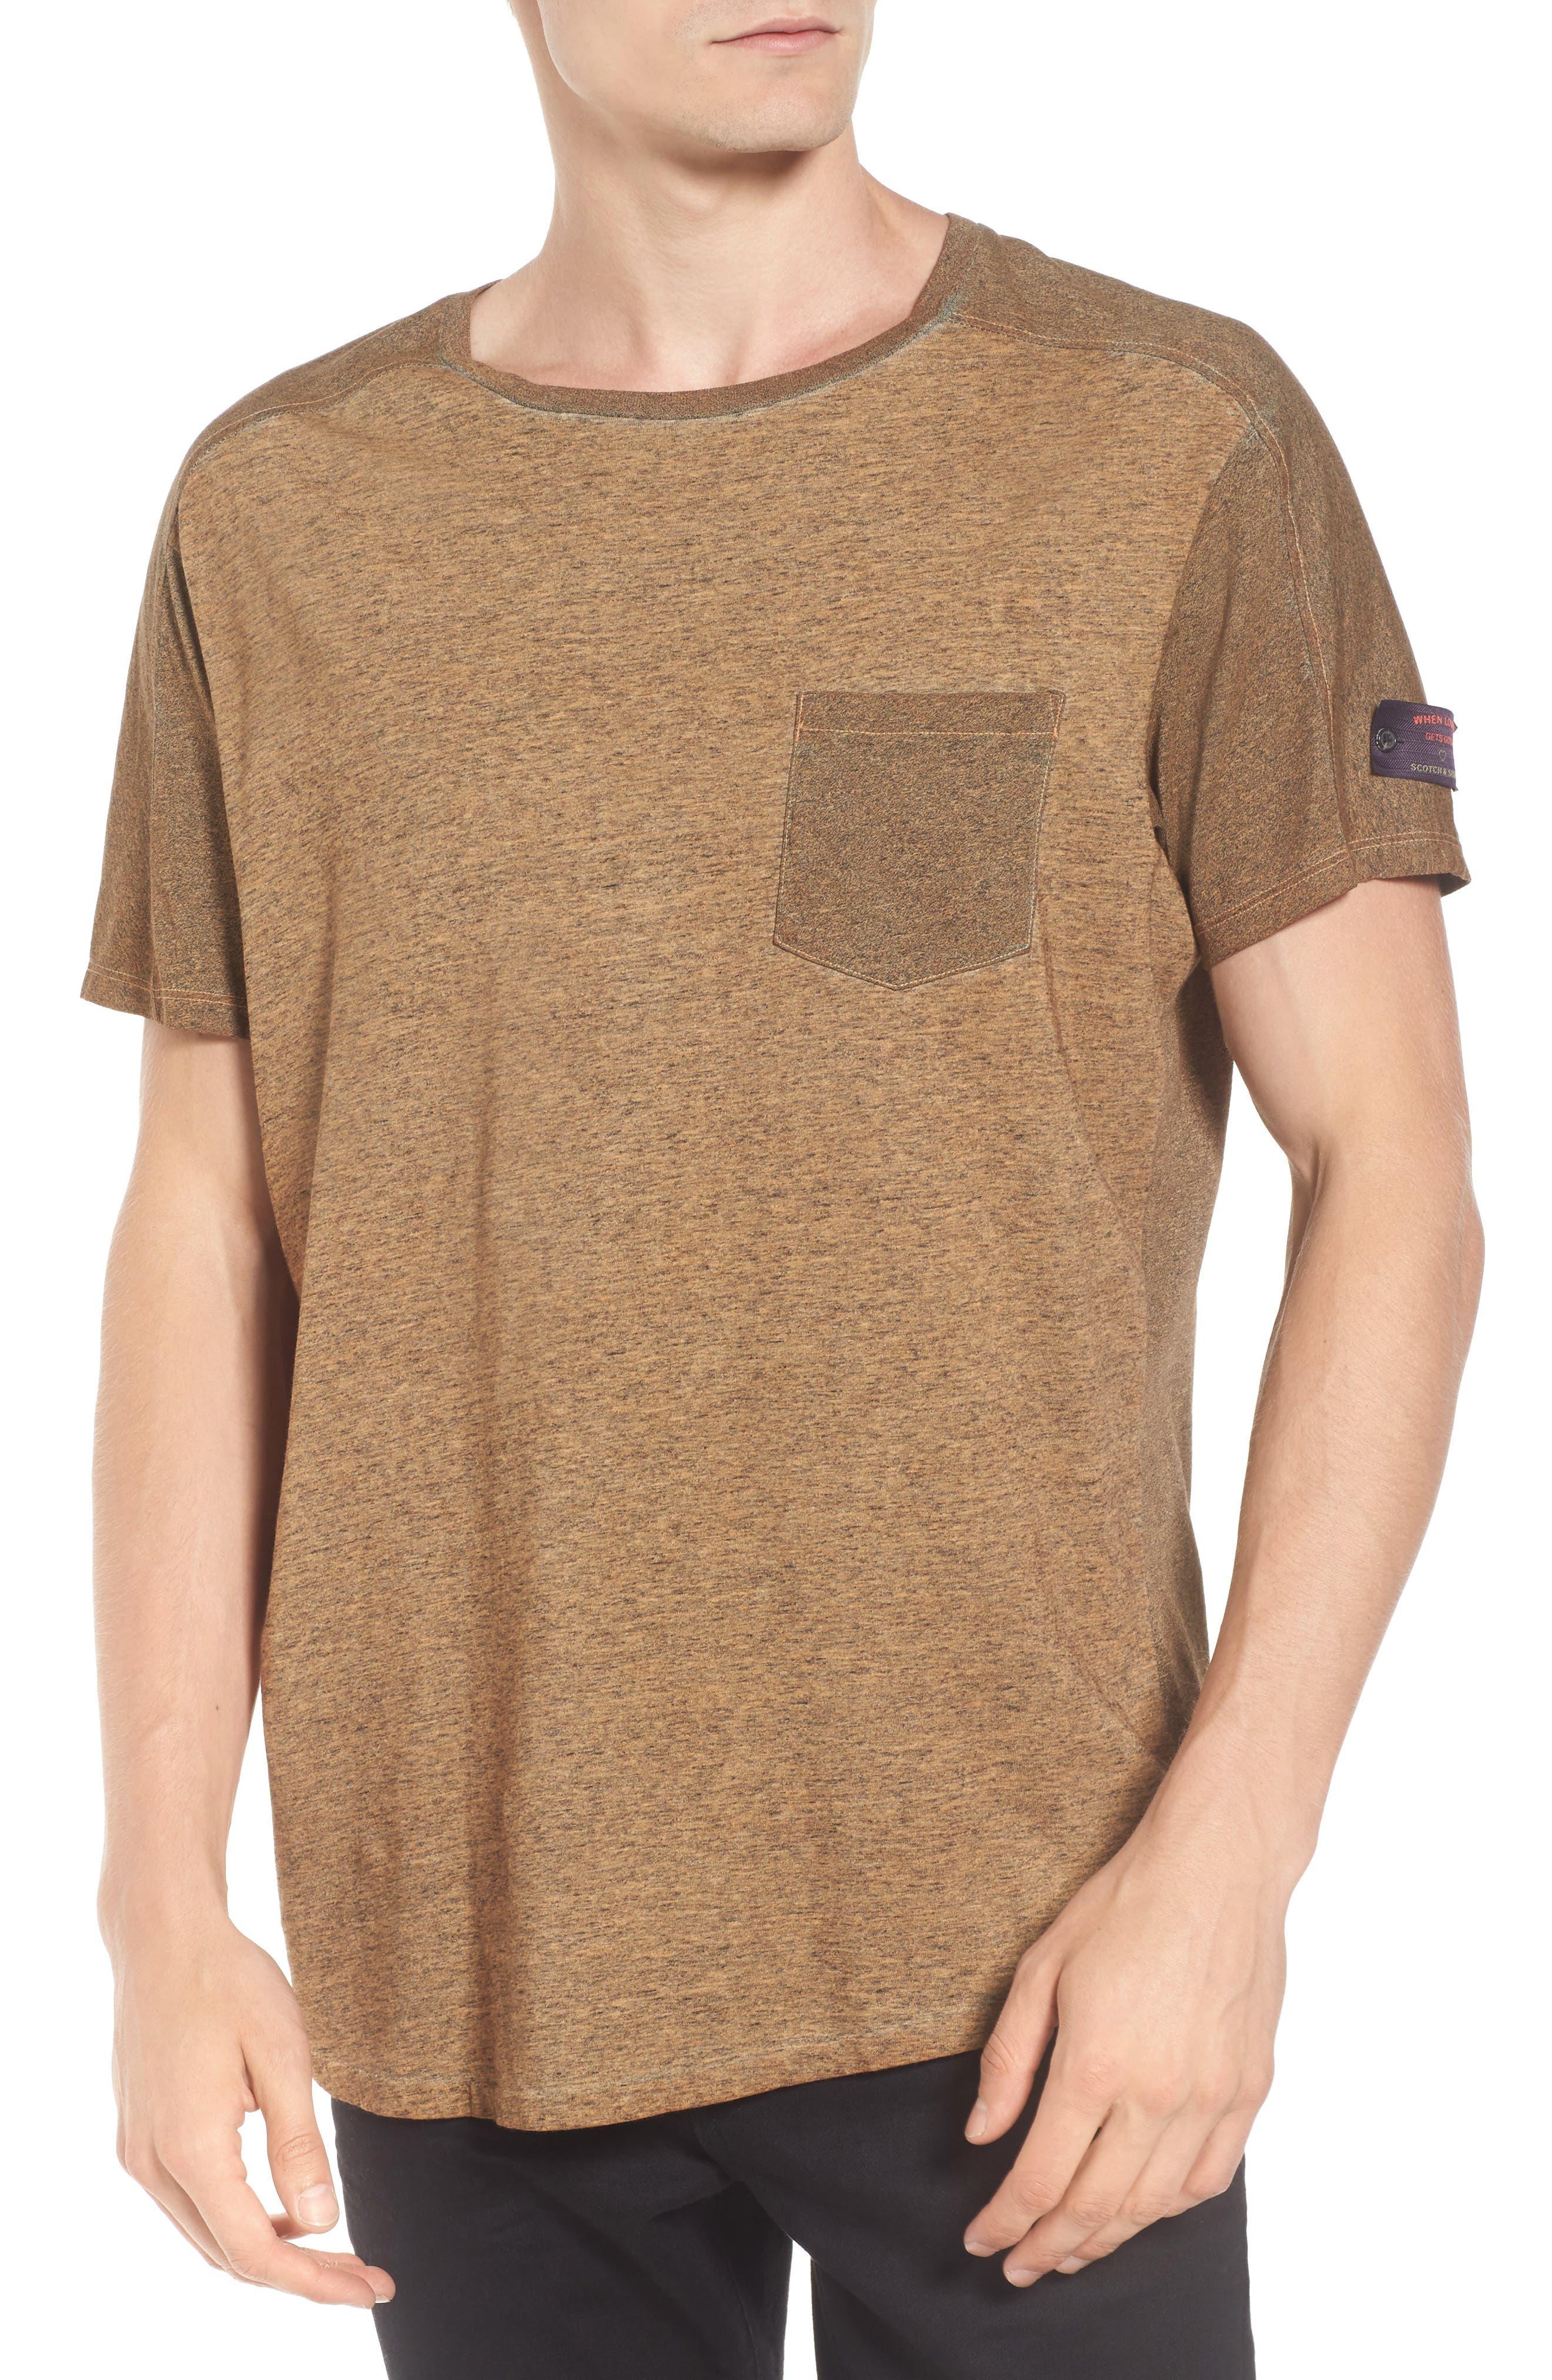 Main Image - Scotch & Soda Oil-Washed Pocket T-Shirt